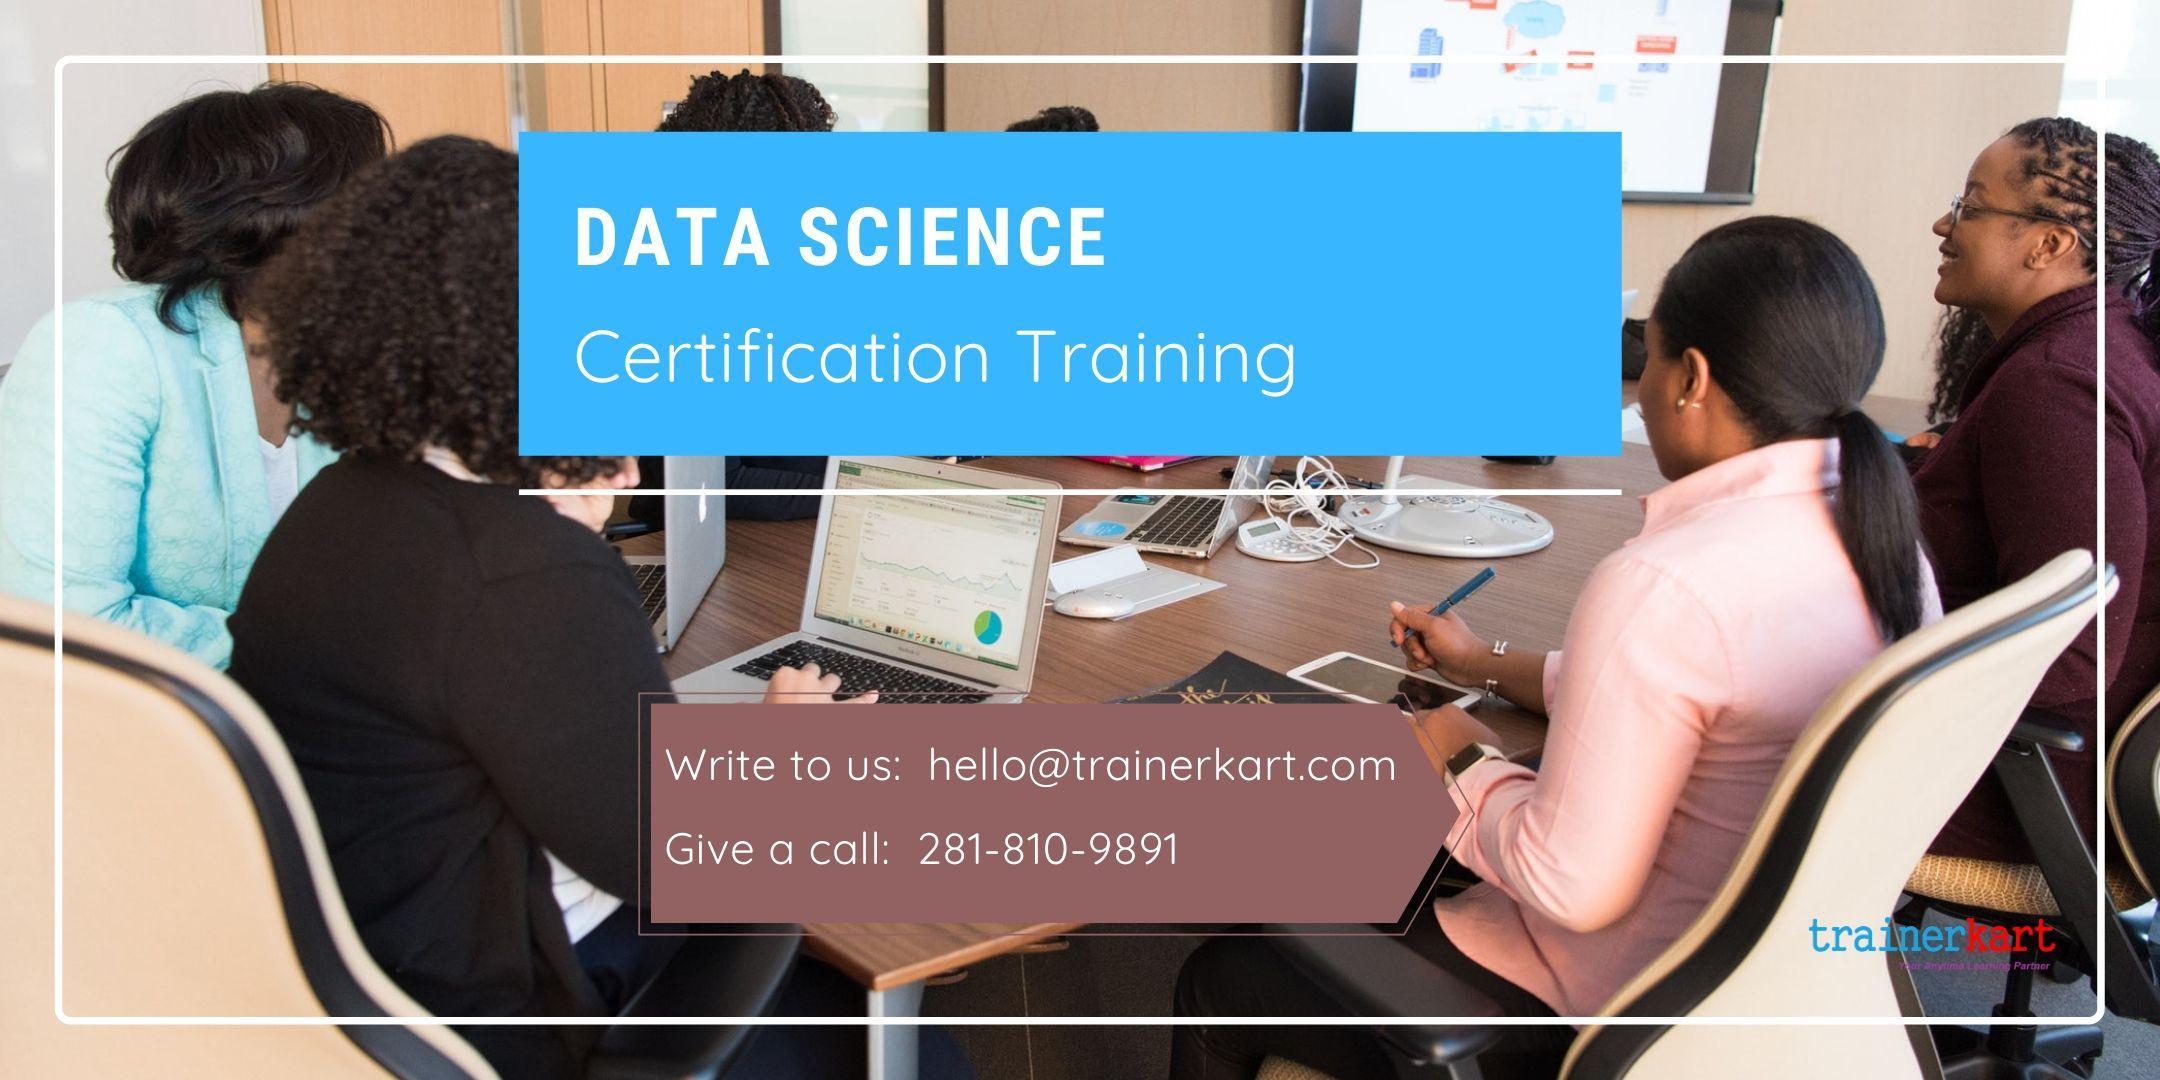 Data Science 4 day classroom Training in Miami, FL